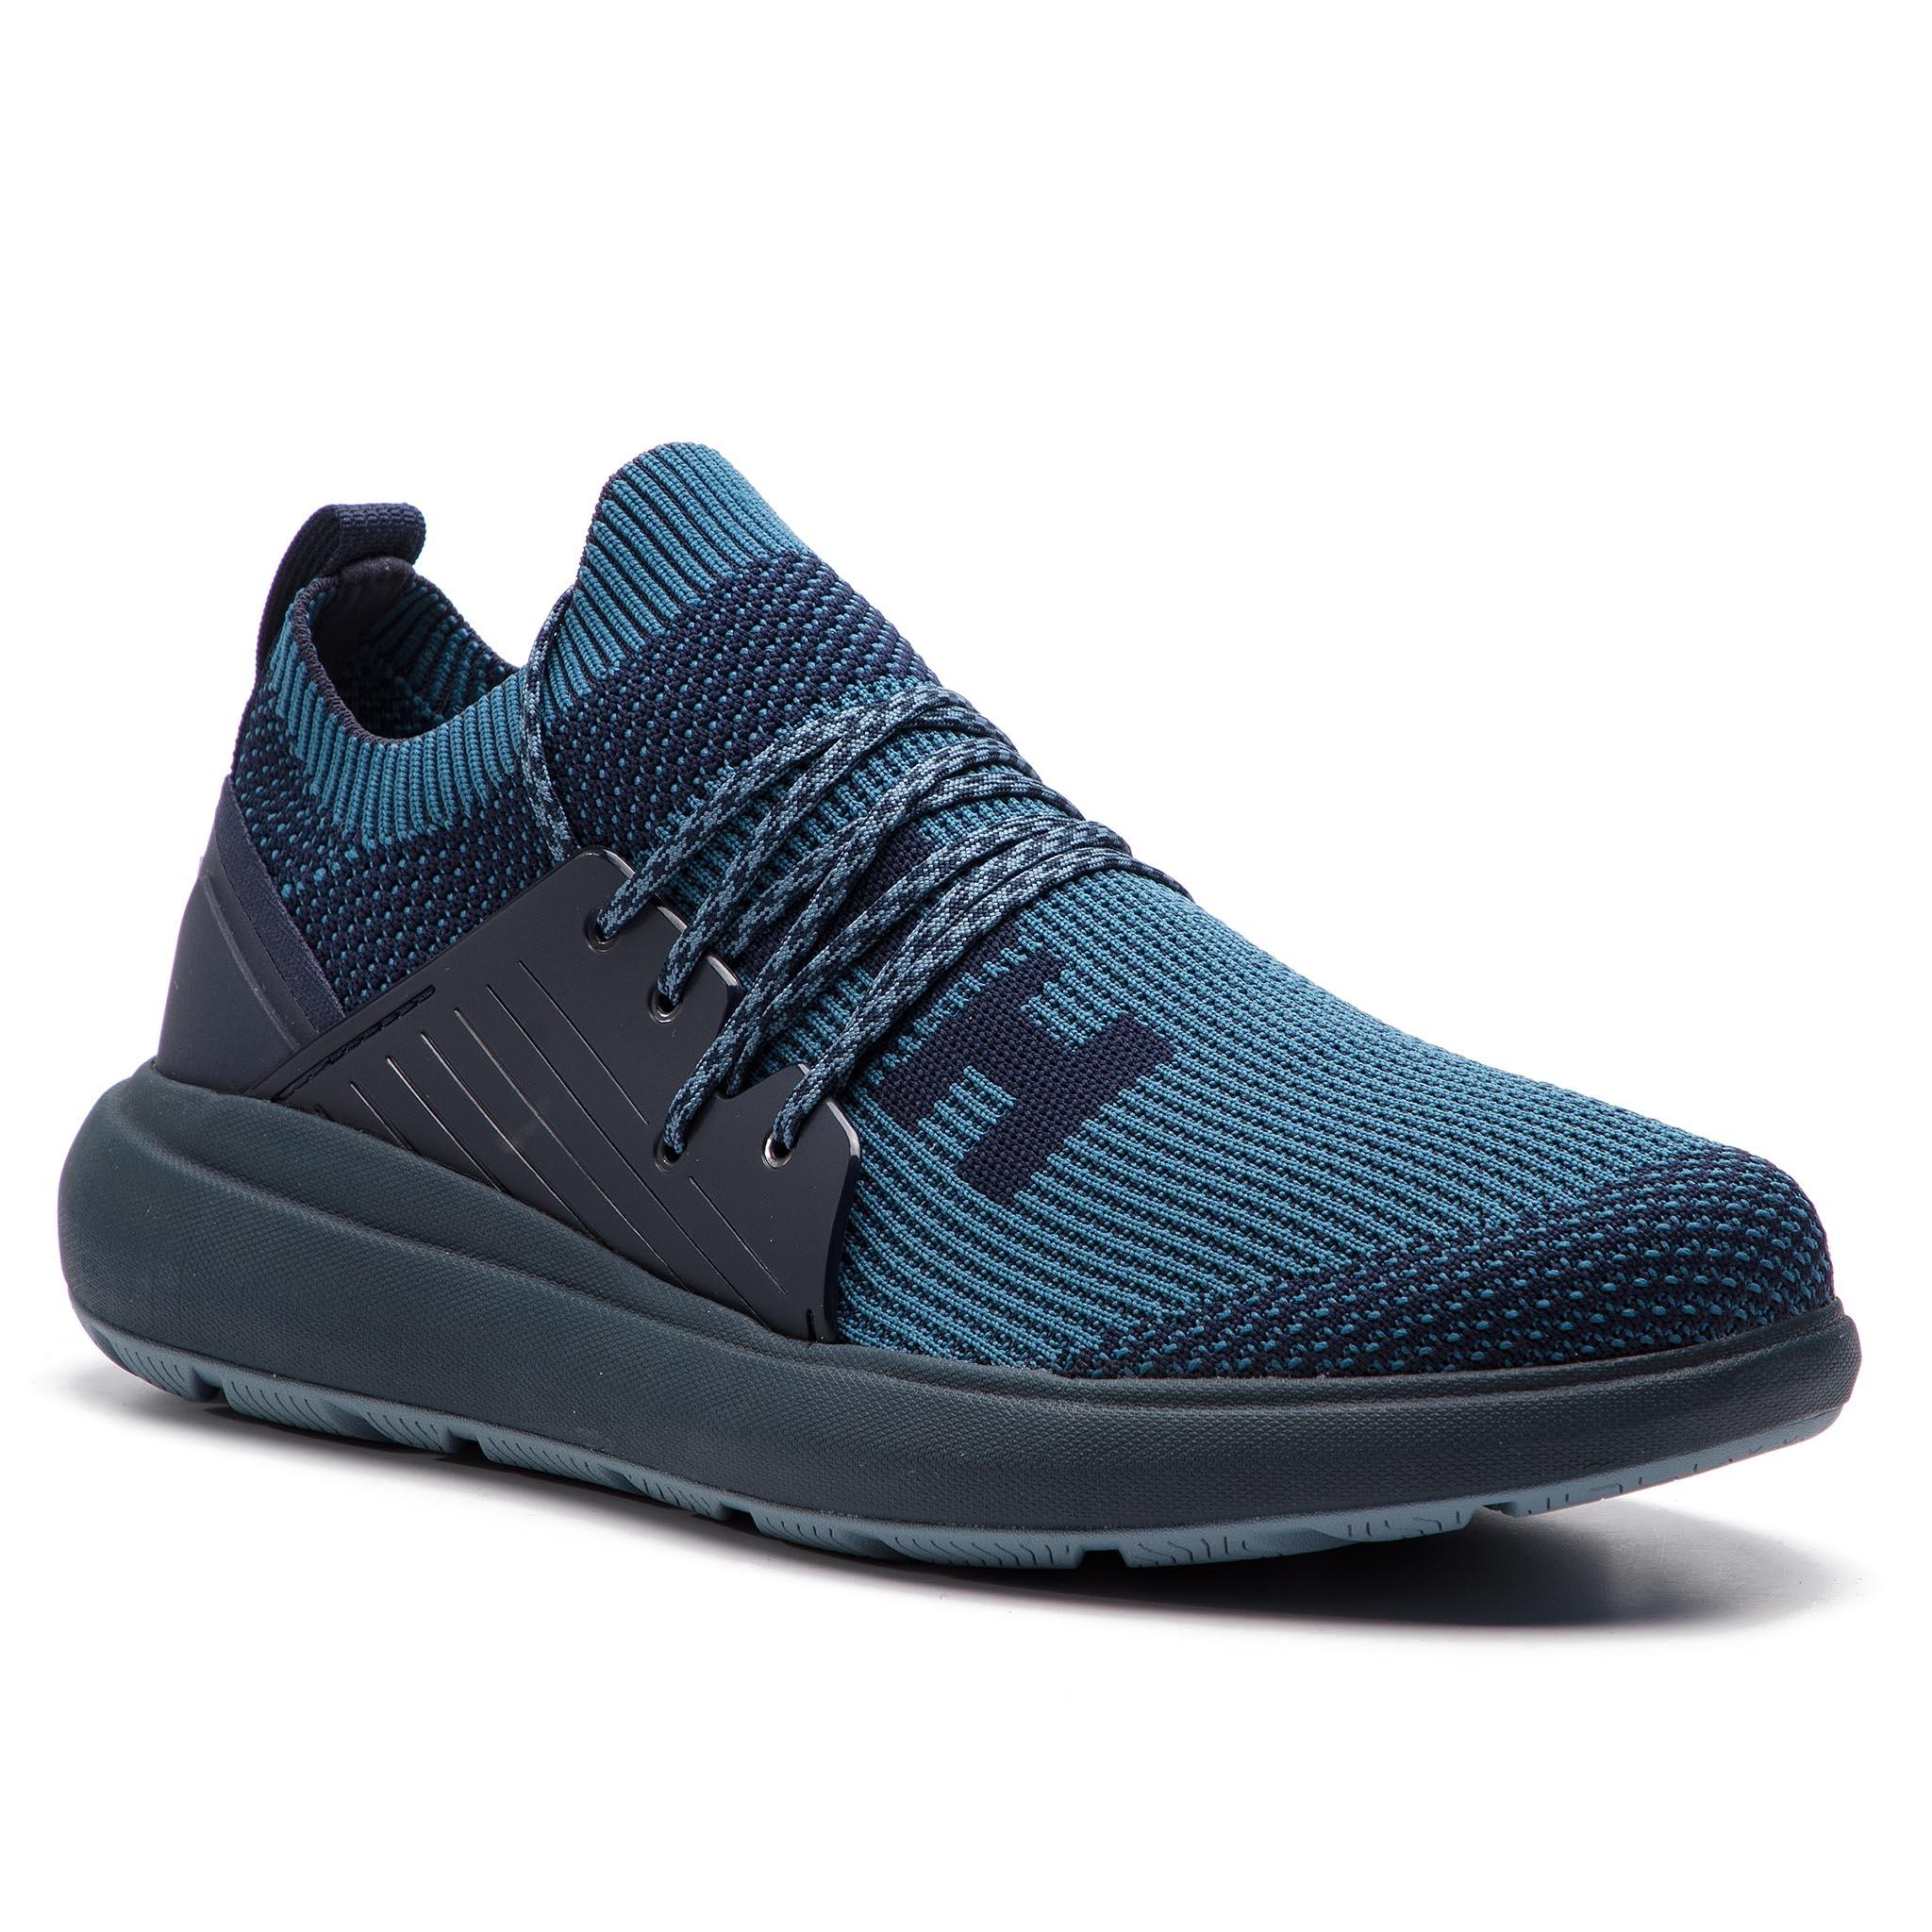 de7d6a1fd9 ... HELLY HANSEN - Razorskiff Shoe 114-90.680 Blue Nights/Blue Mirage/Citadel.  -29%. Sportcipő ...